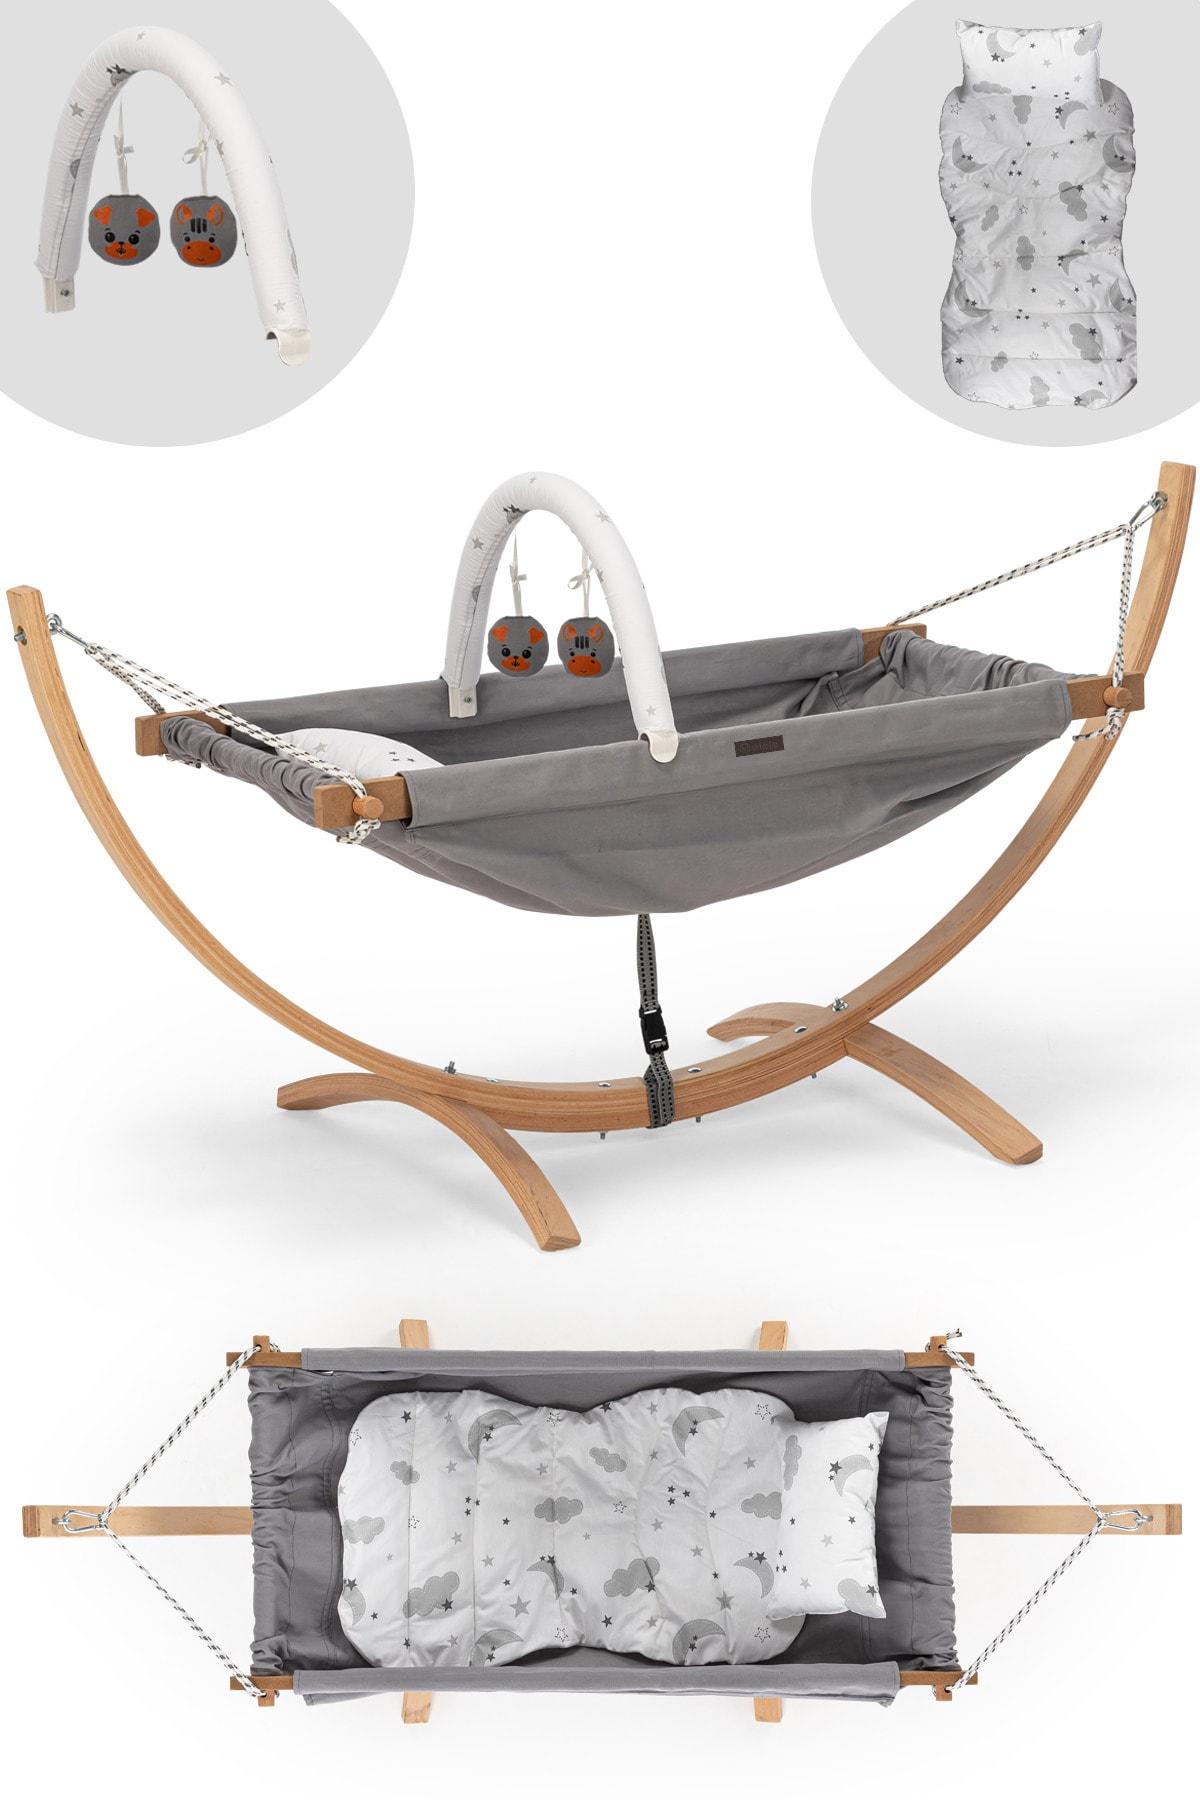 Portable Baby Hammock Crib Furniture Gray Mother Kids Room Bed Safe Cot Swing Elastic Seat Bassinet Brib Free Shipping children swing Cradle Bassinet Bedside Easy Folding Dreamer Bedside Sleeper Convertible Mini